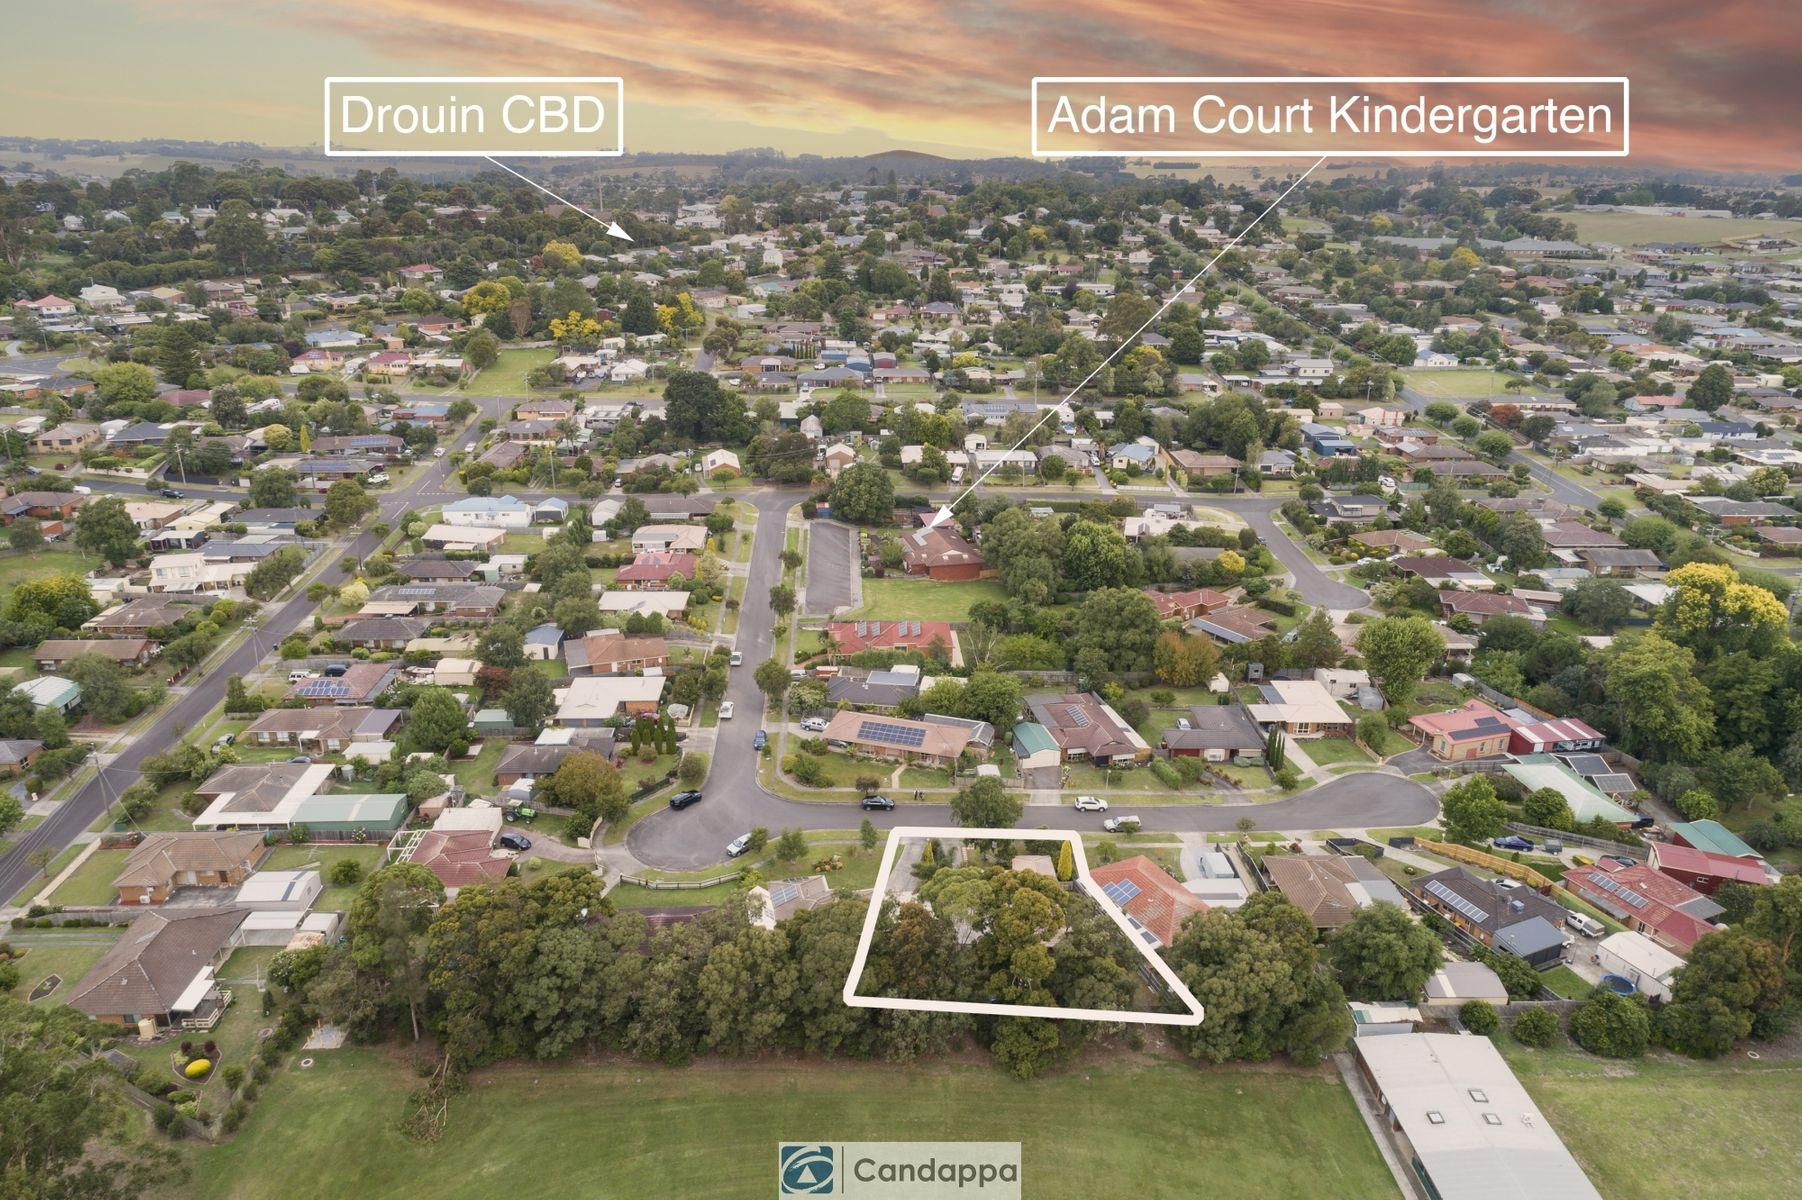 15 Adam Court, Drouin, VIC 3818